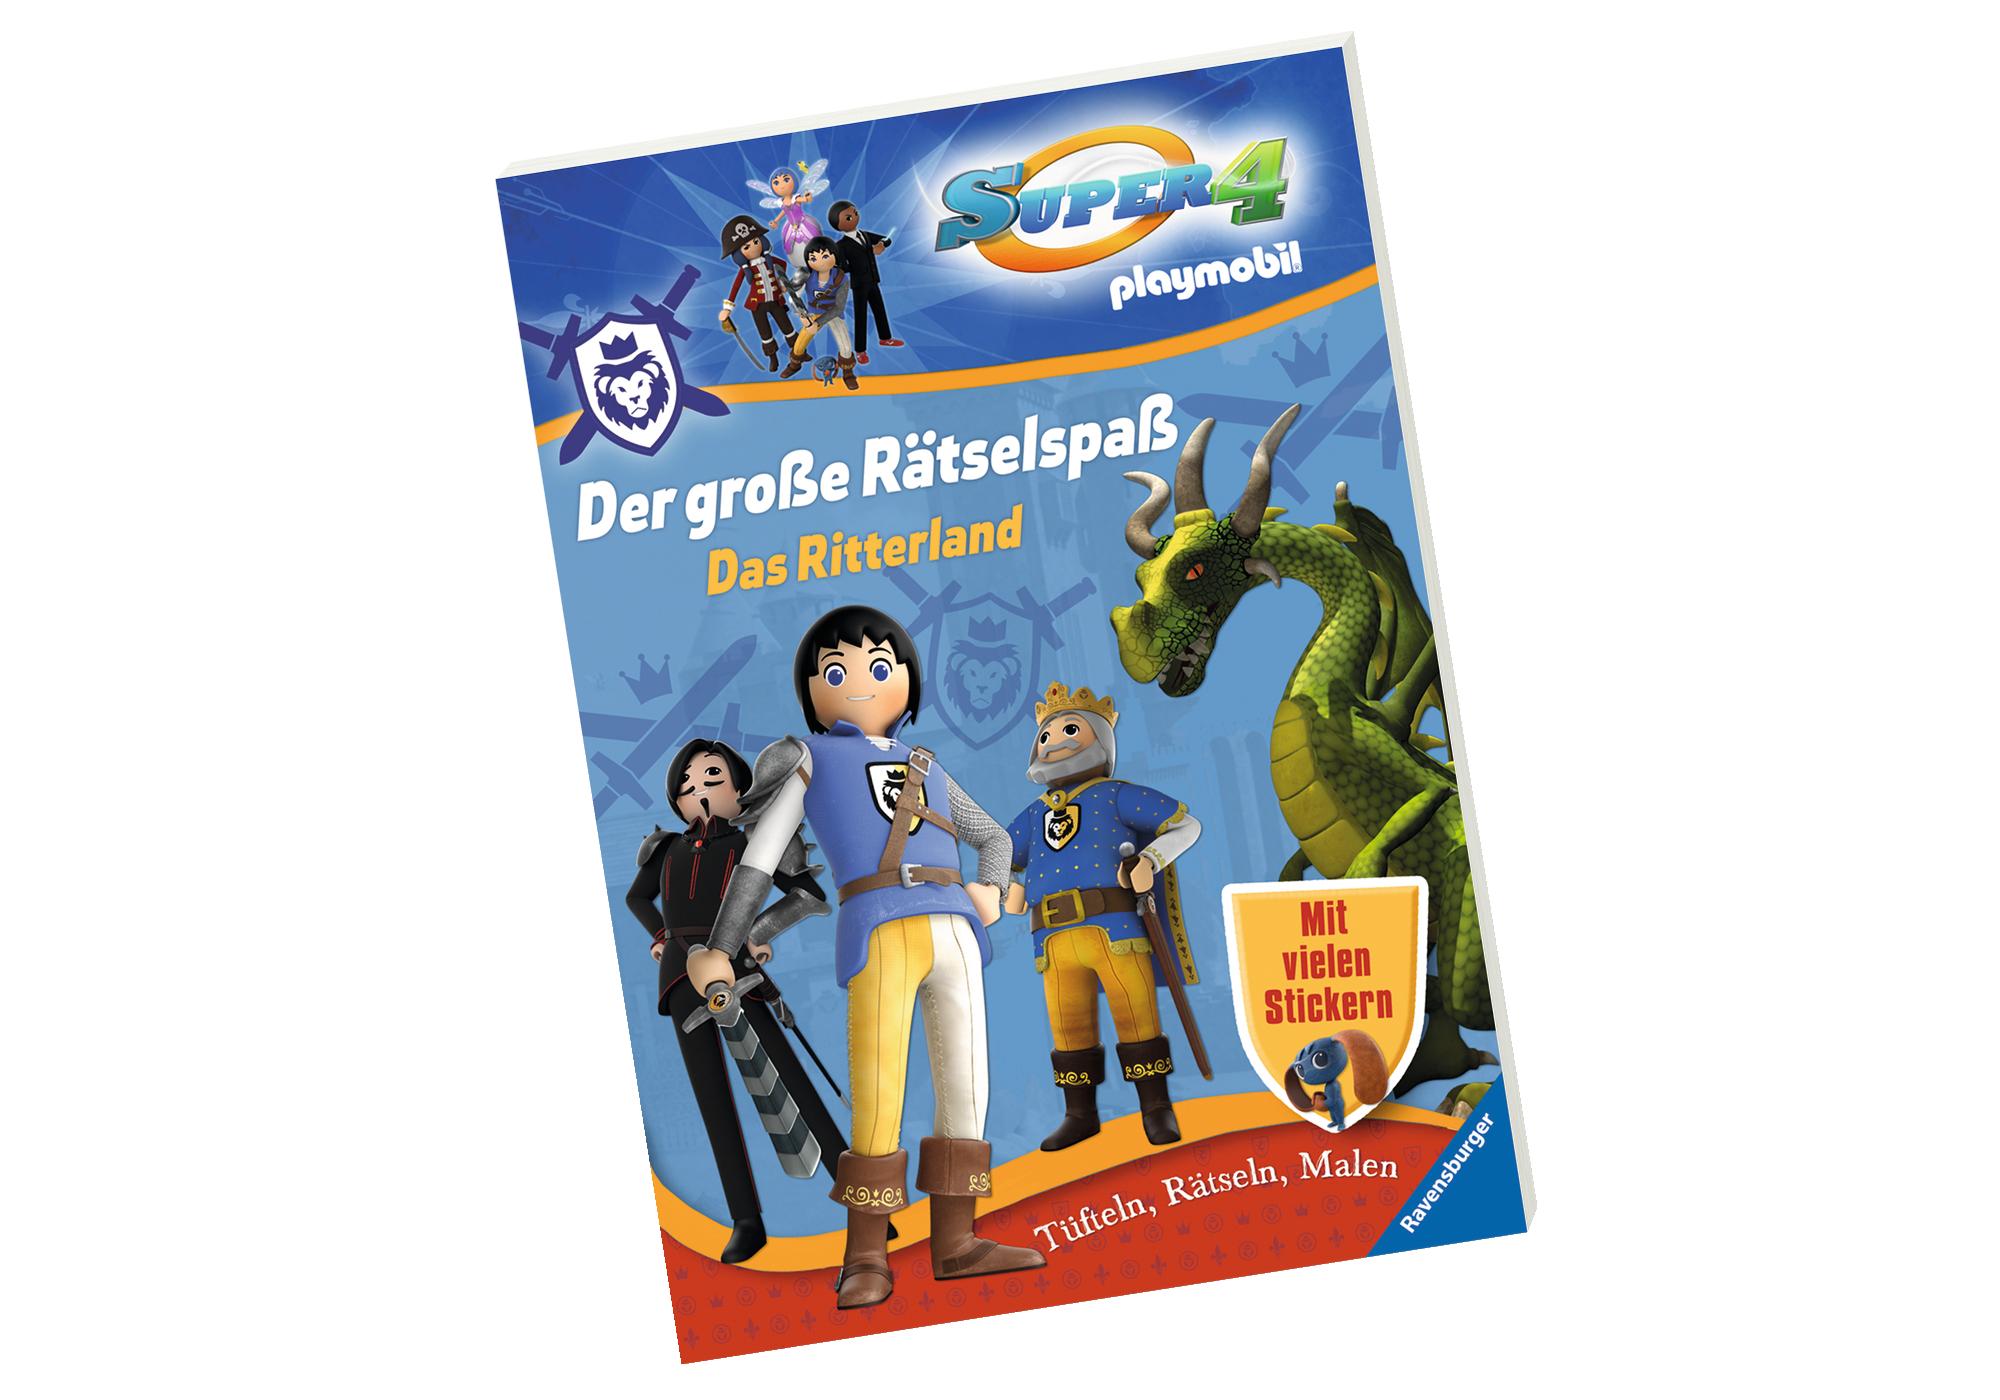 http://media.playmobil.com/i/playmobil/80472_product_detail/Super 4: Der große Rätselspaß - Das Ritterland